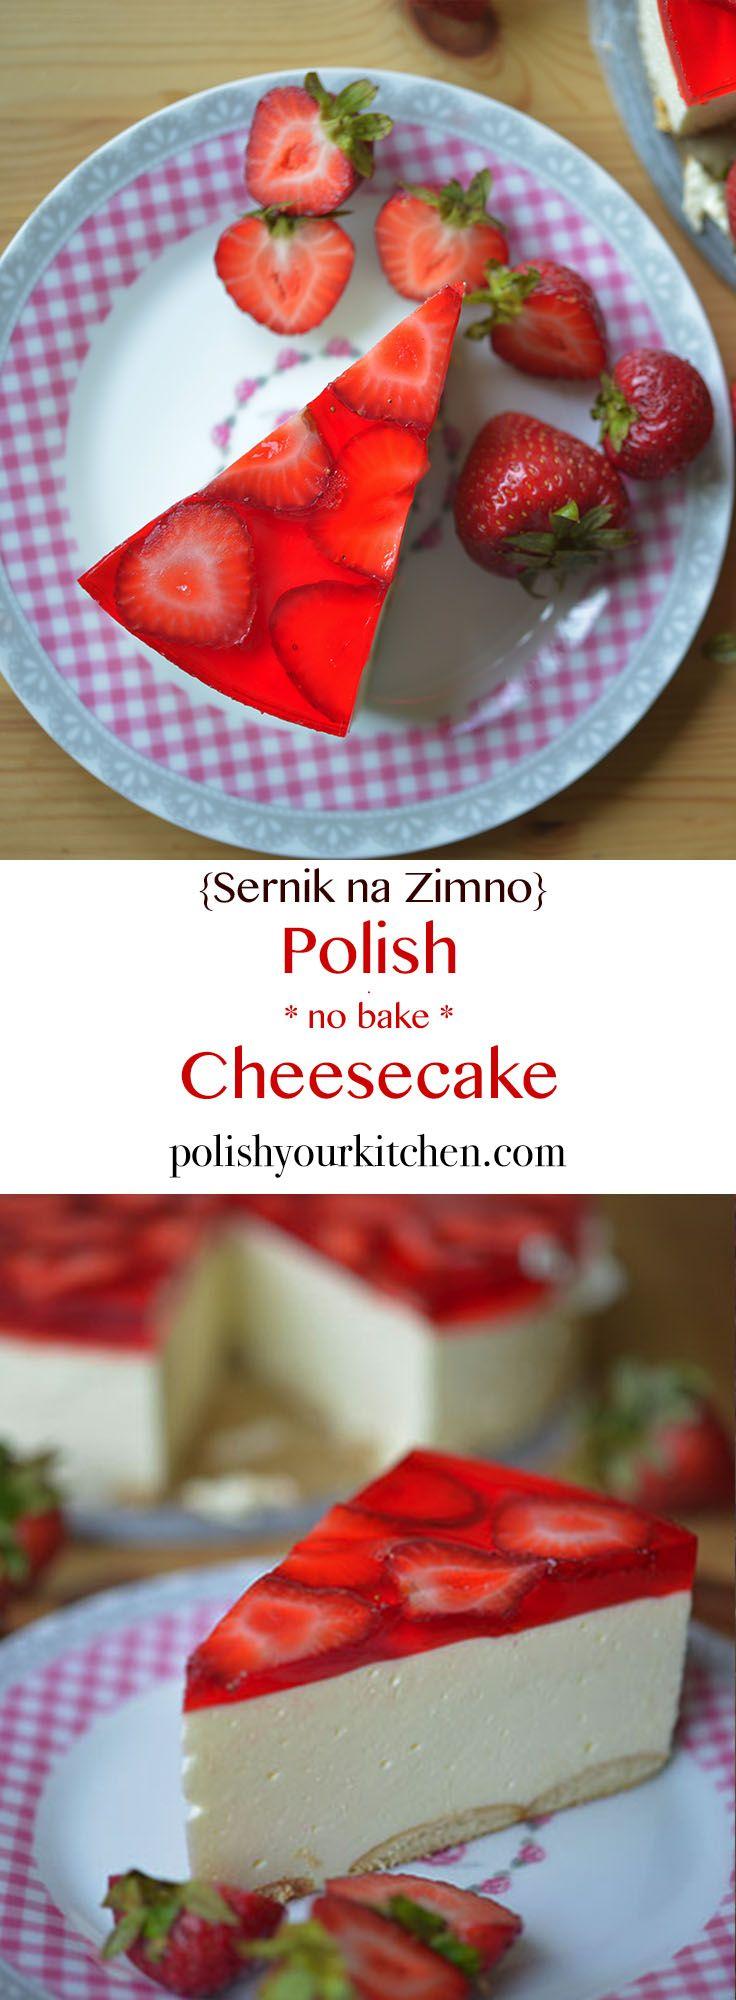 Easy no bake cheesecake, Polish cheesecake called sernik na zimno requires no baking skills. It's a delicious summer dessert that everyone loves.